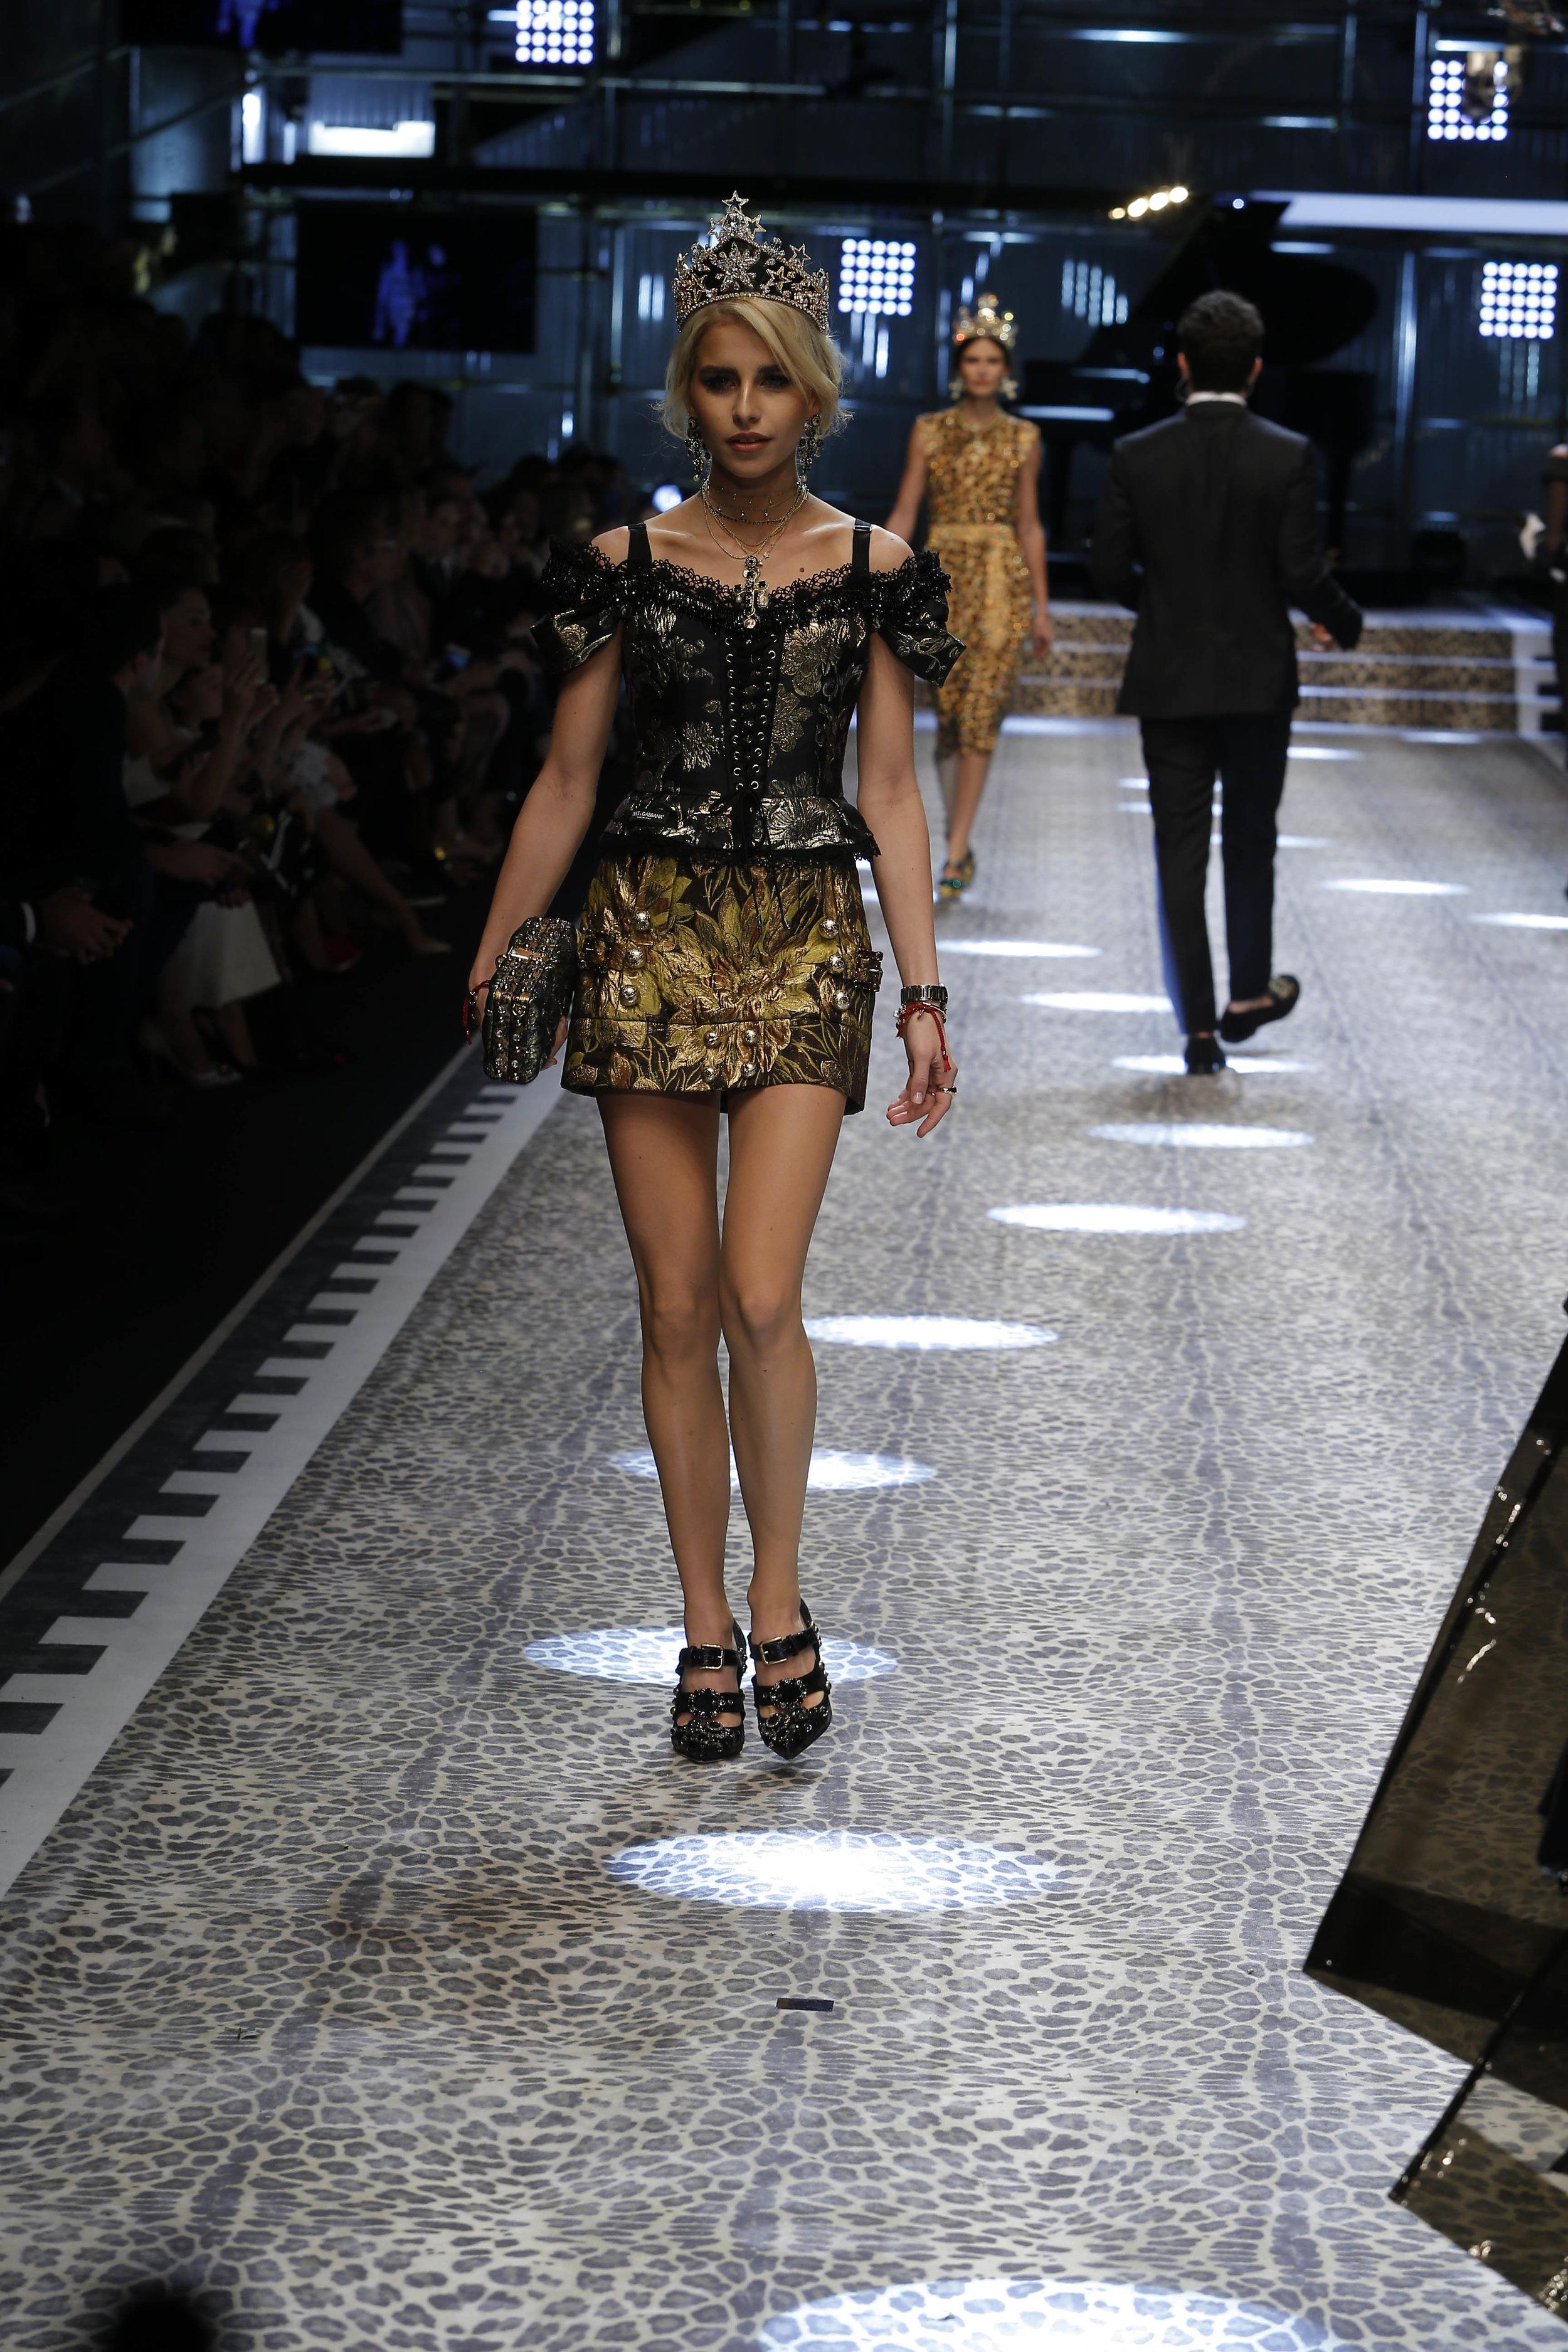 Dolce&Gabbana_women's fashion show fw17-18_Runway_images (115).jpg